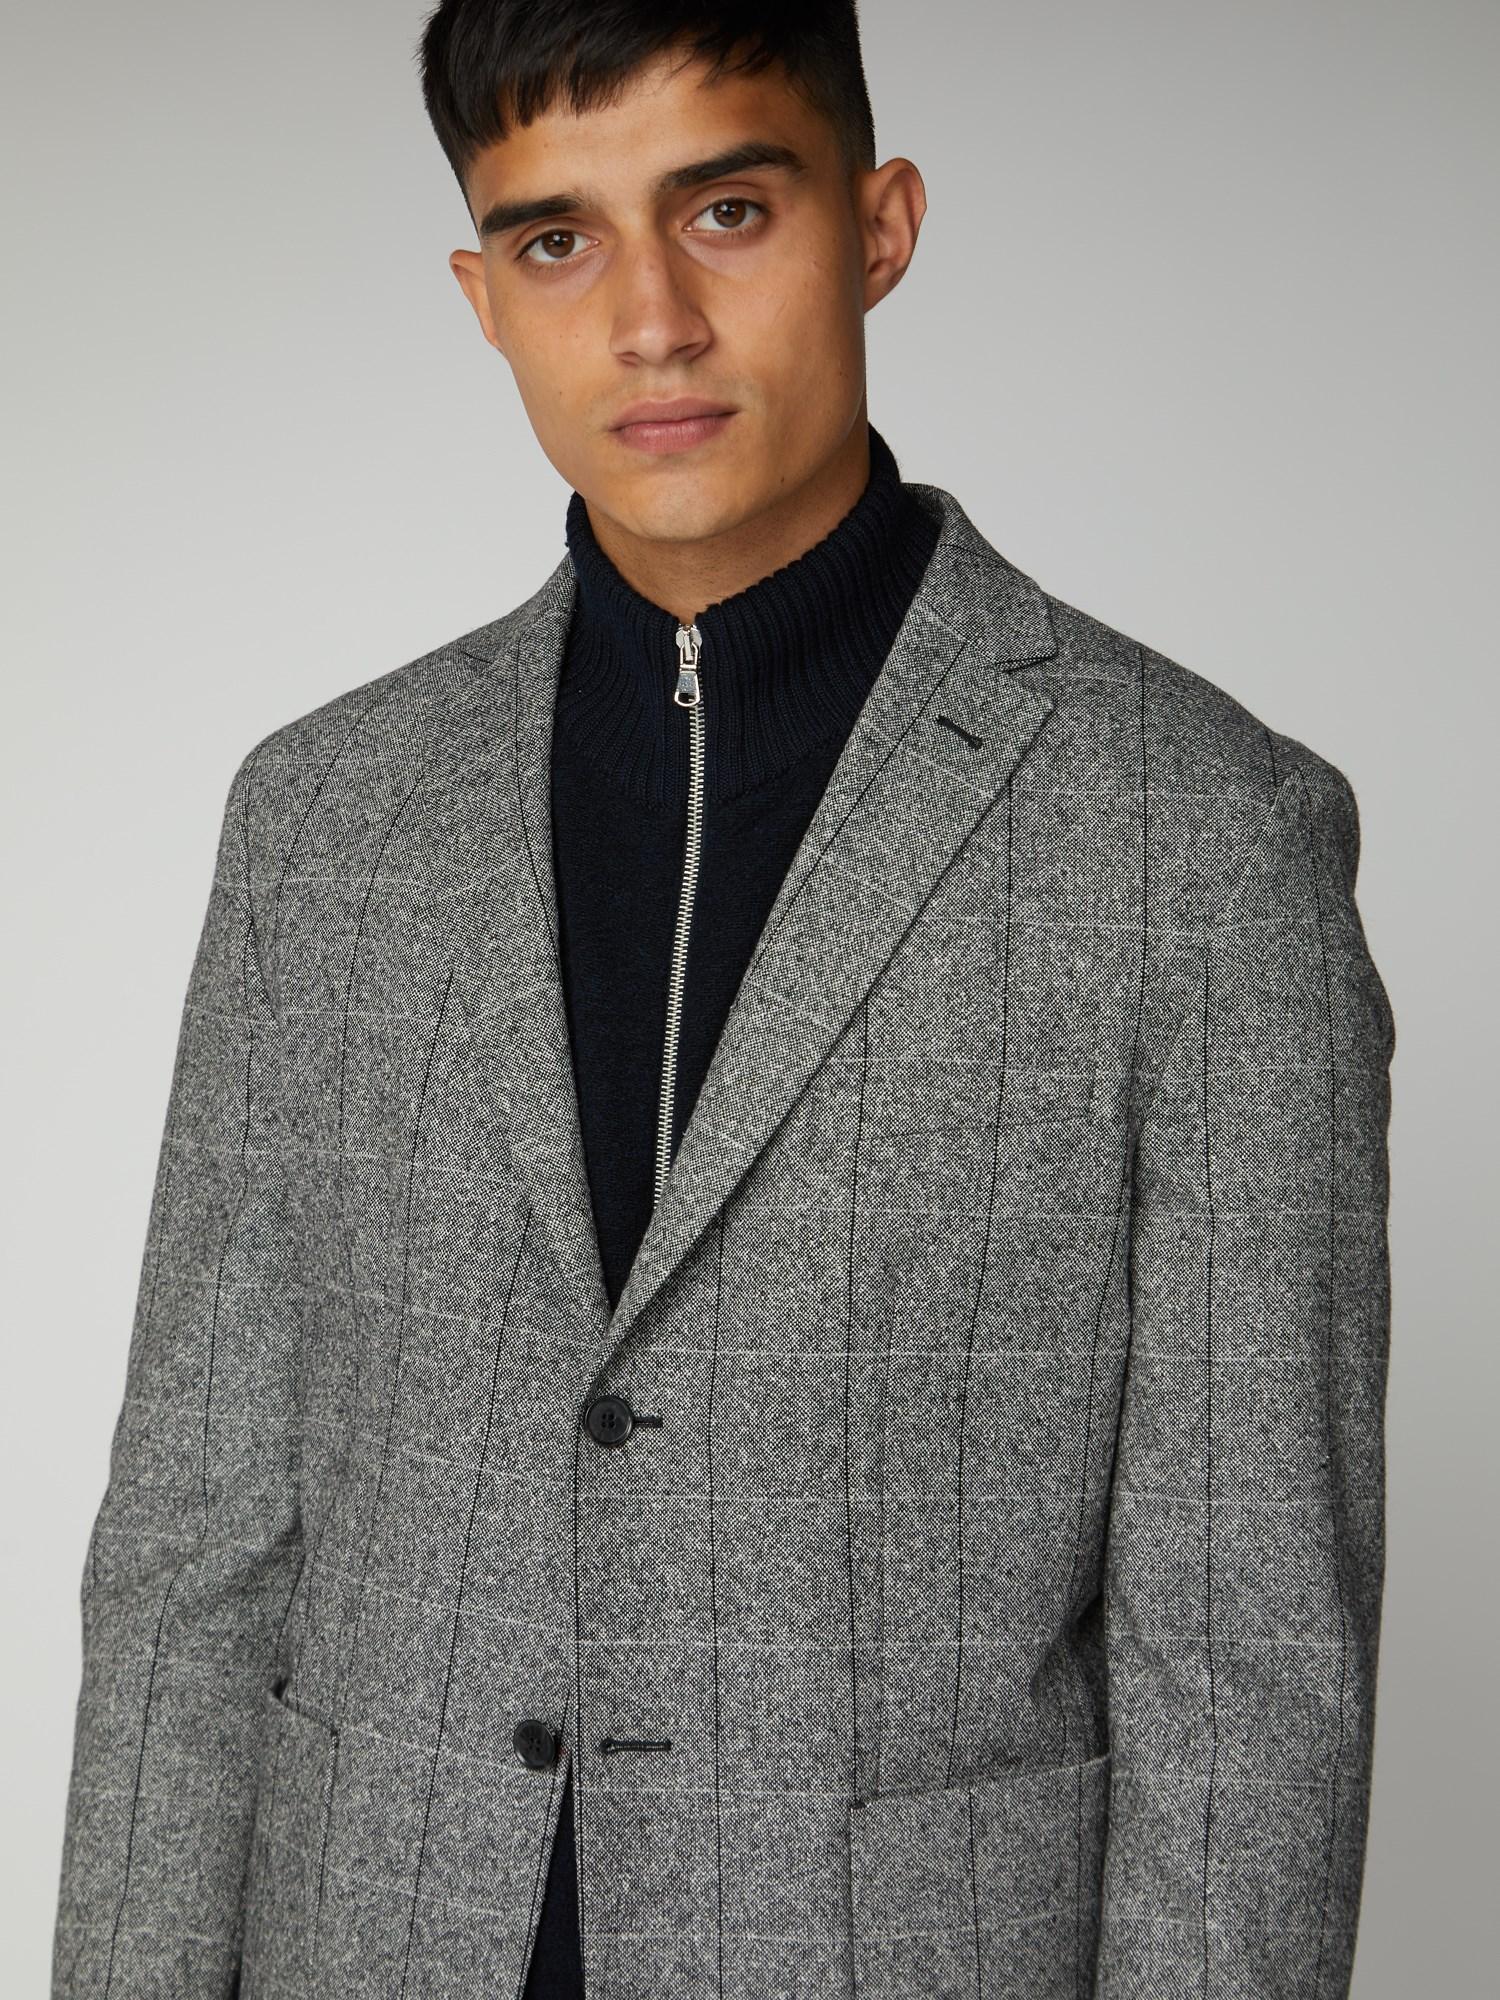 Salt and Pepper Suit